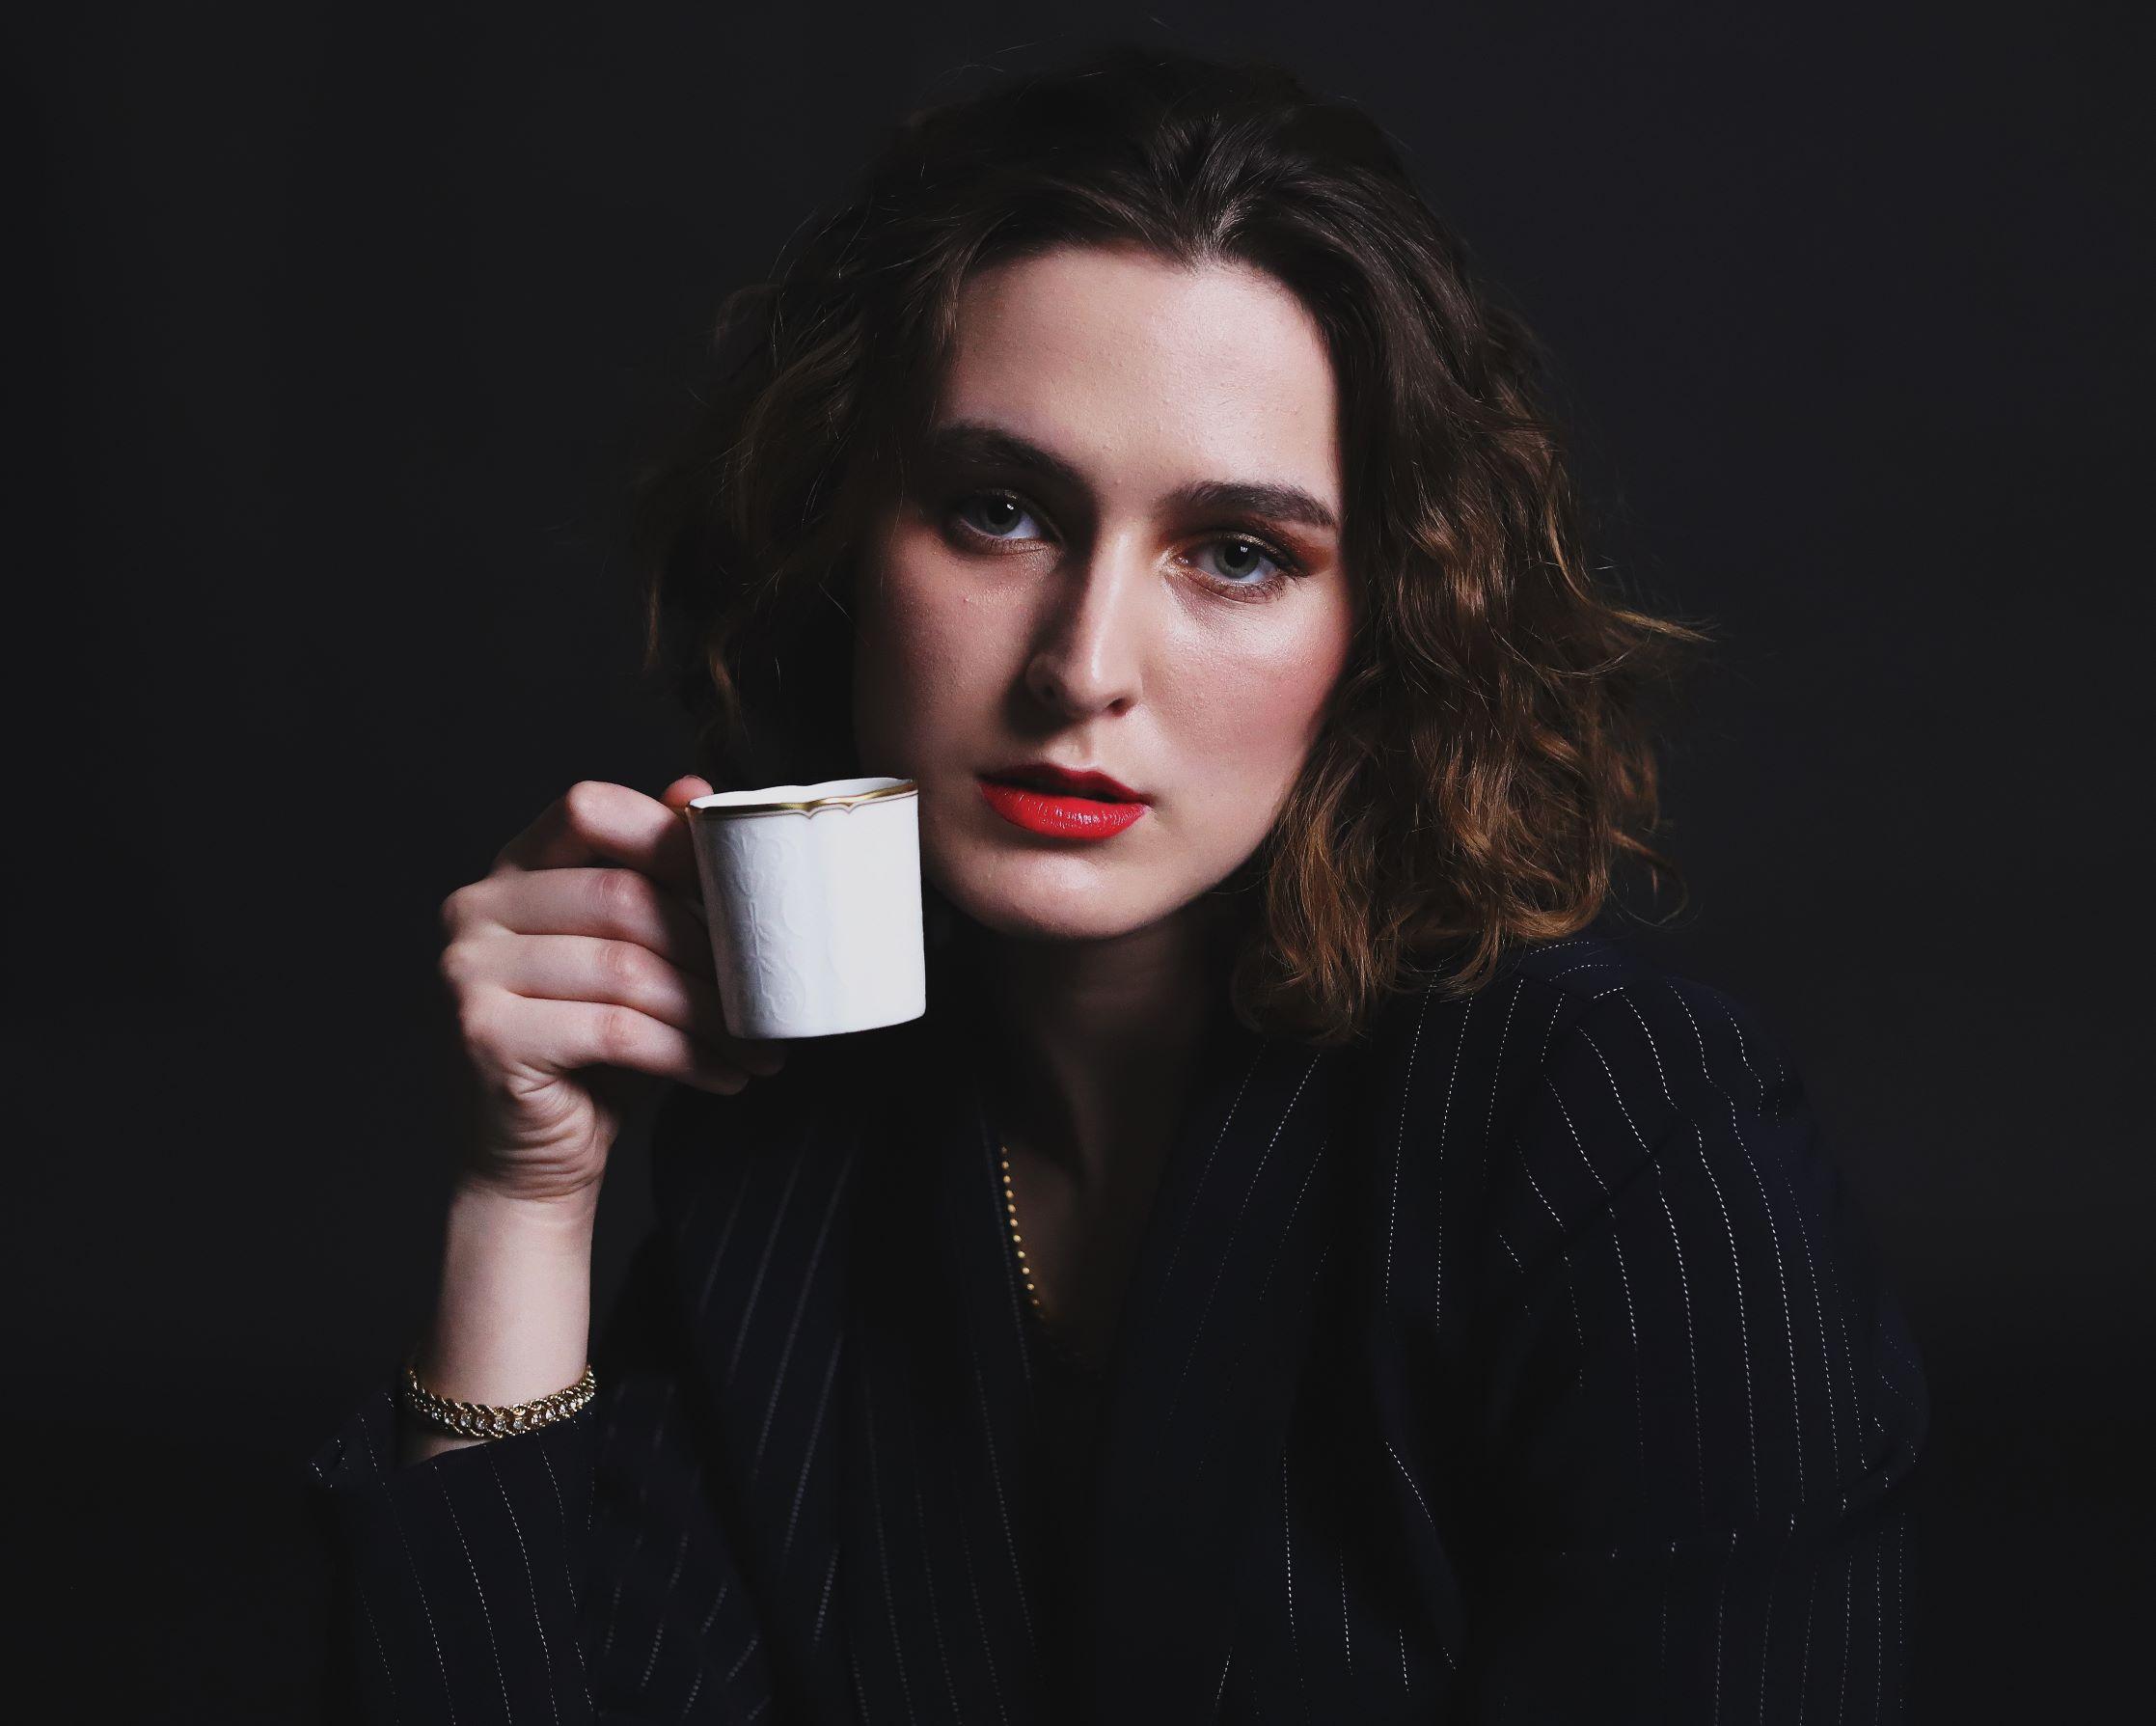 LeClair Organics Coffee Saskatoon, Coffee Roaster Saskatoon commercial photography with Jenna Rozlin 17